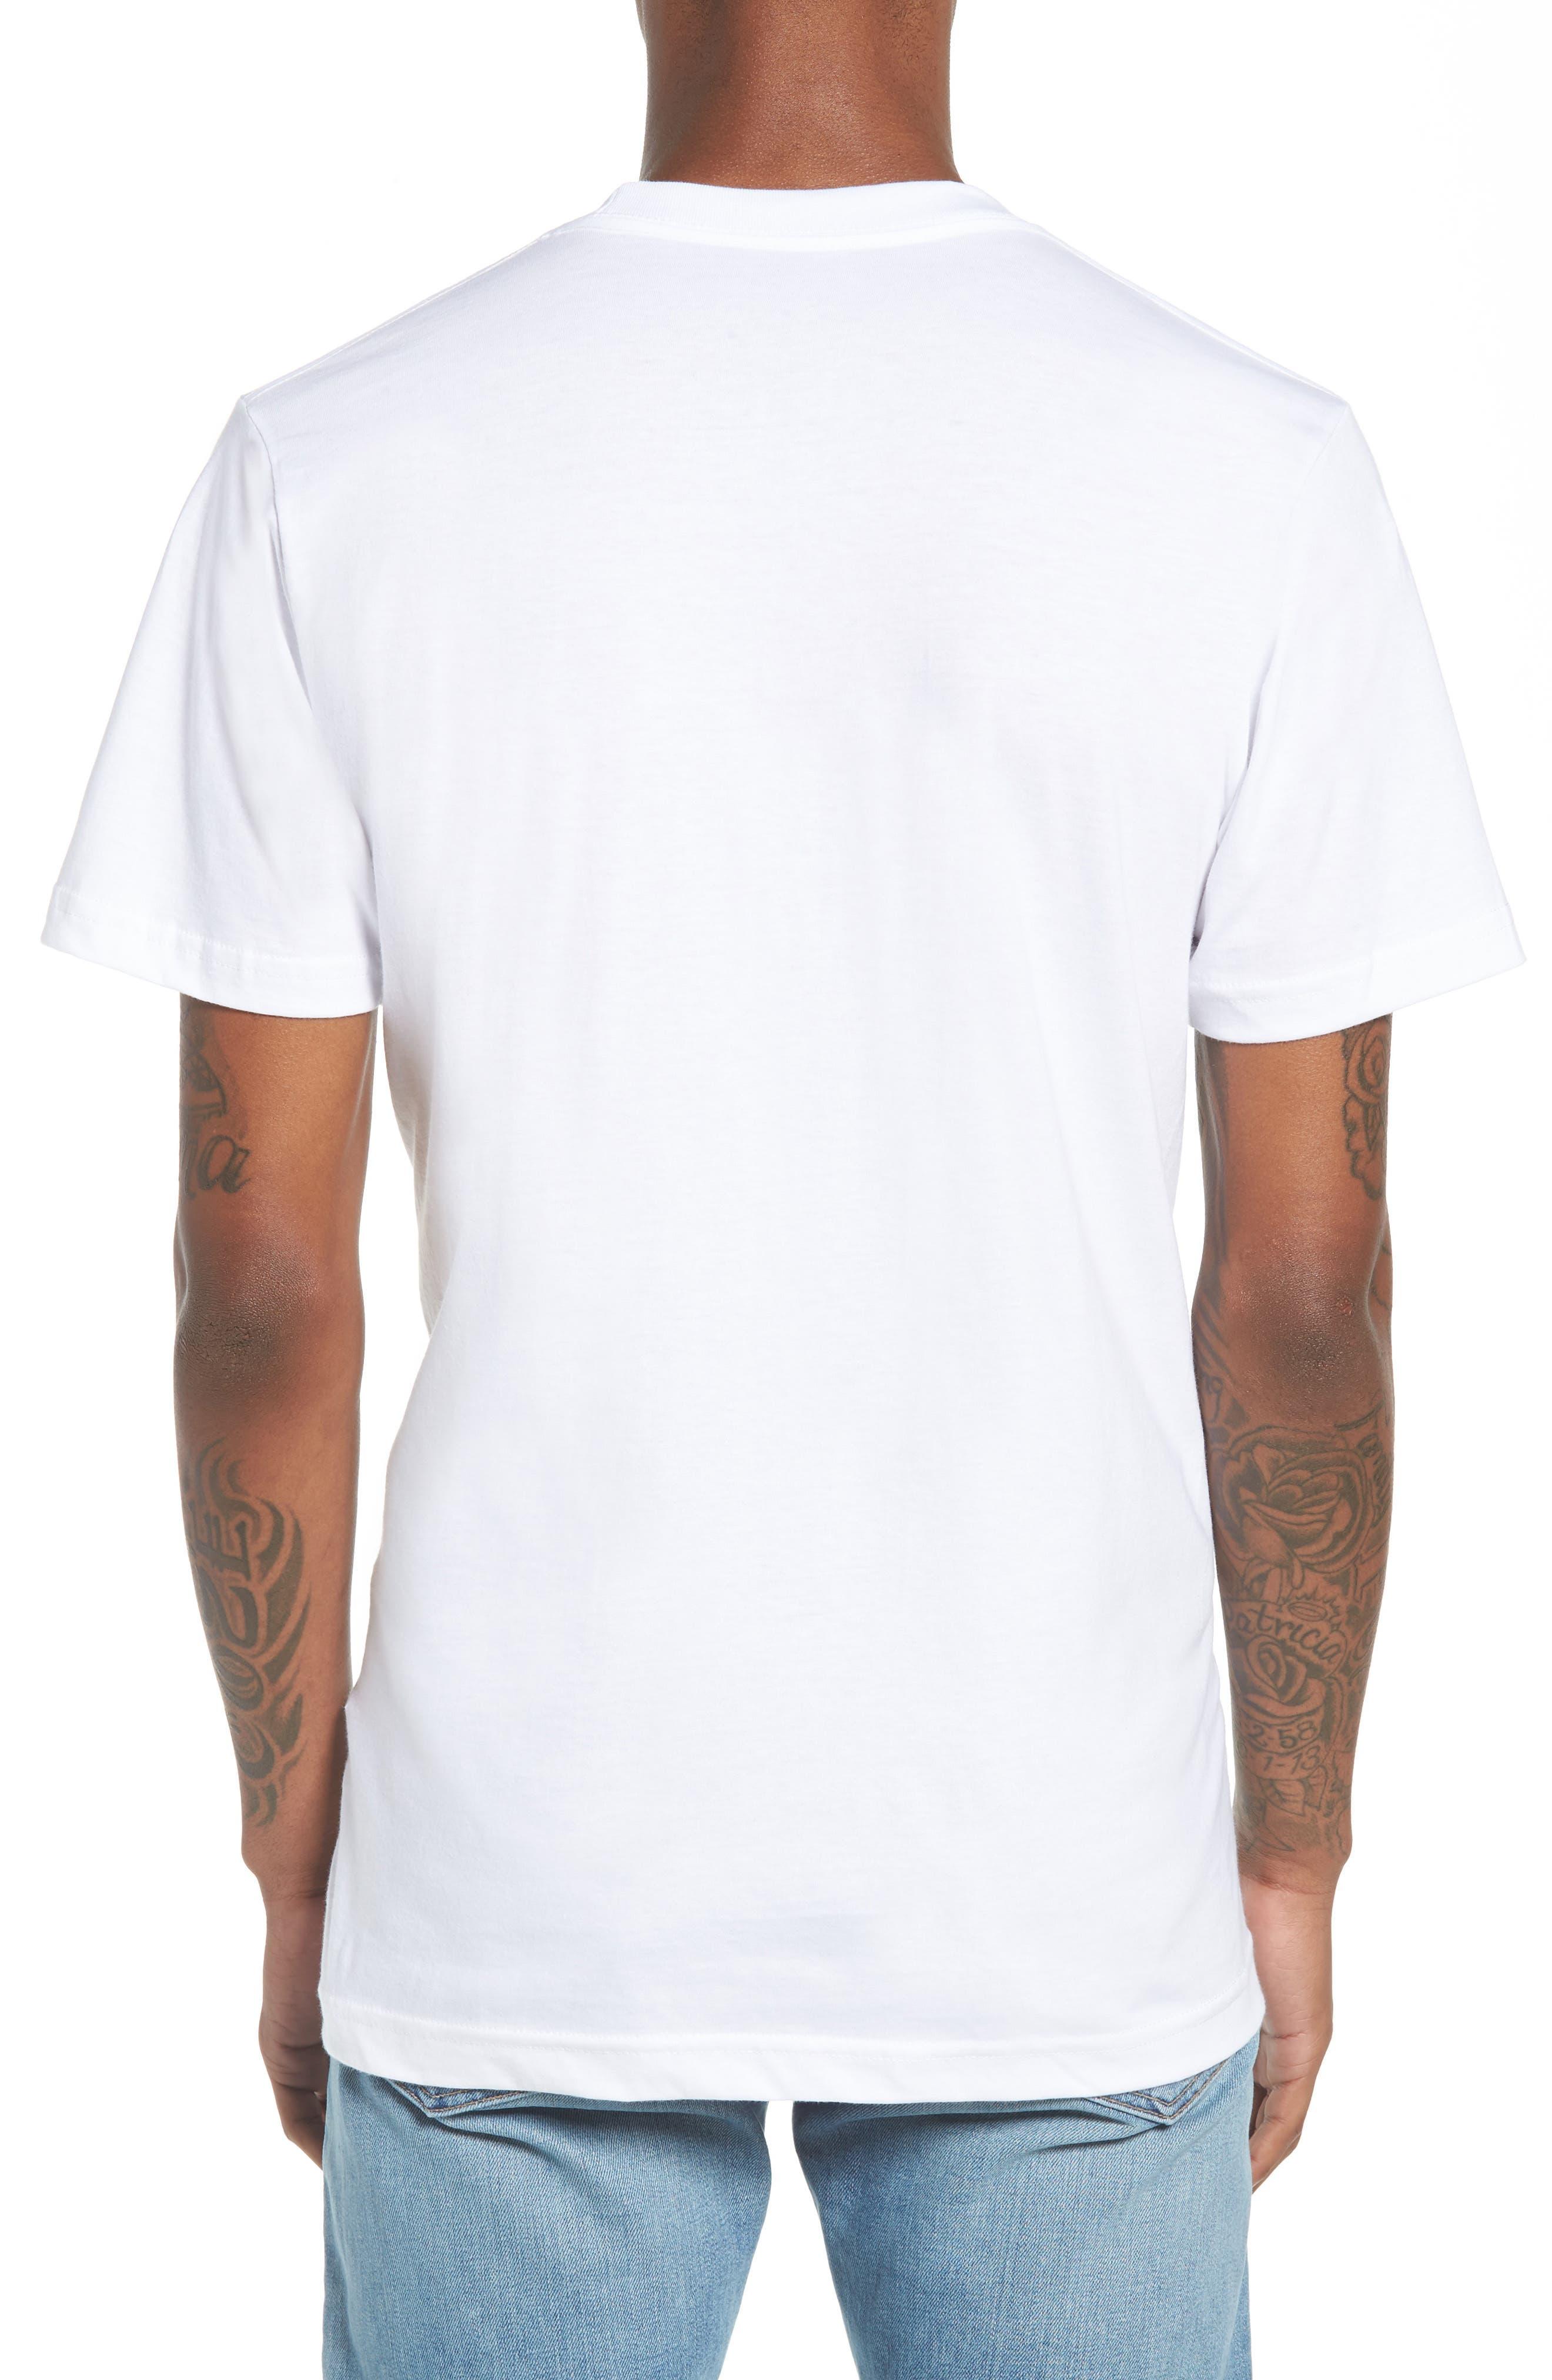 NY Apple Graphic T-Shirt,                             Alternate thumbnail 2, color,                             White